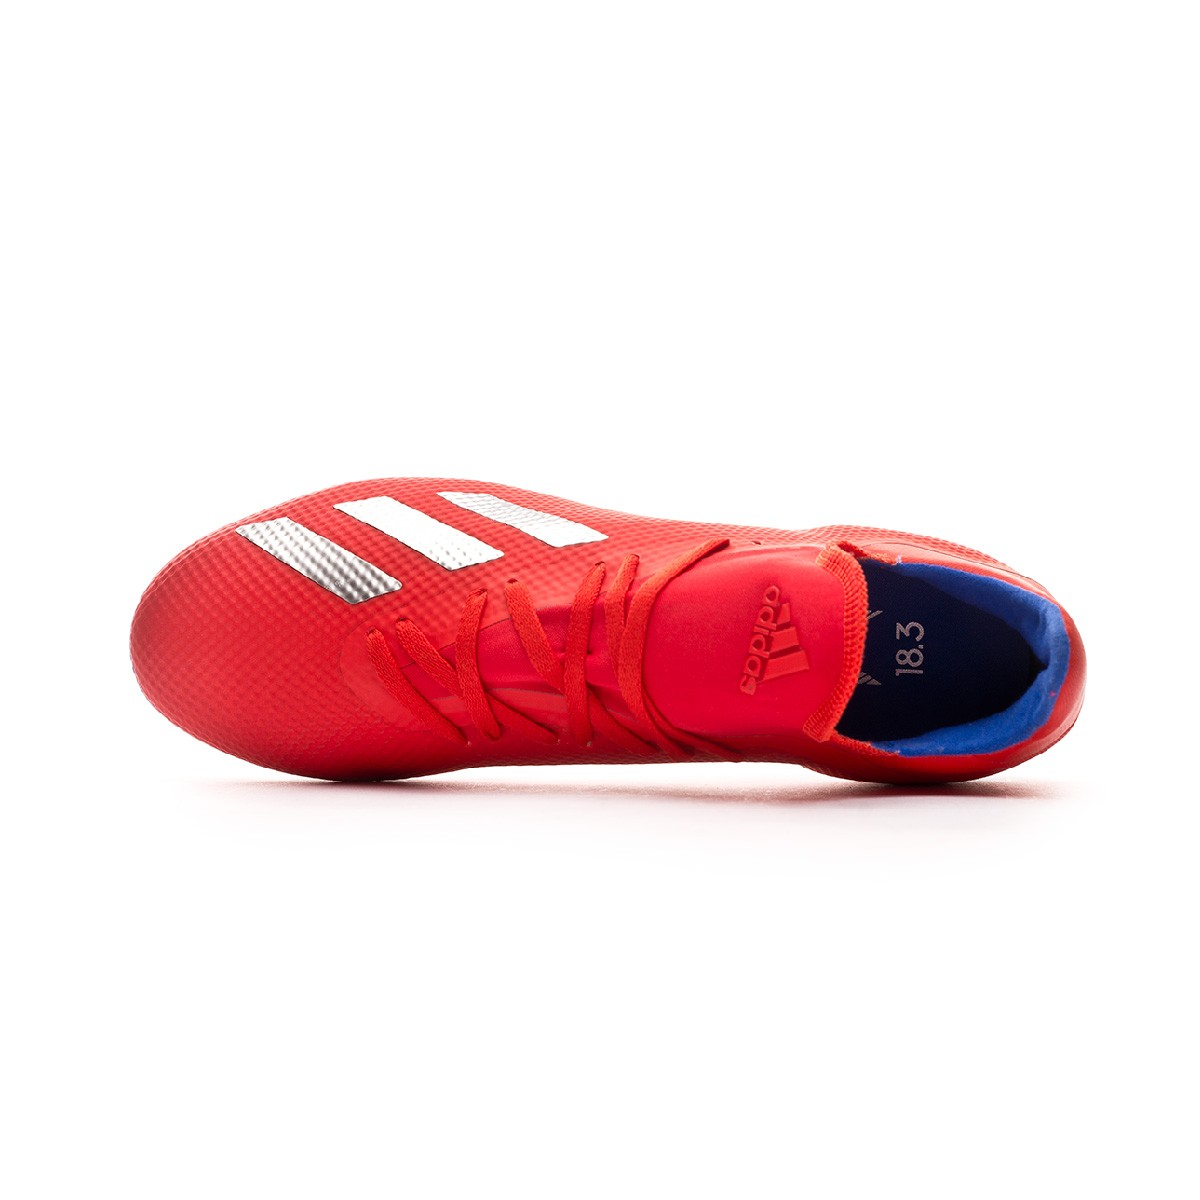 e64214feb4f17 Chuteira adidas X 18.3 AG Active red-Silver metallic-Bold blue - Loja de  futebol Fútbol Emotion